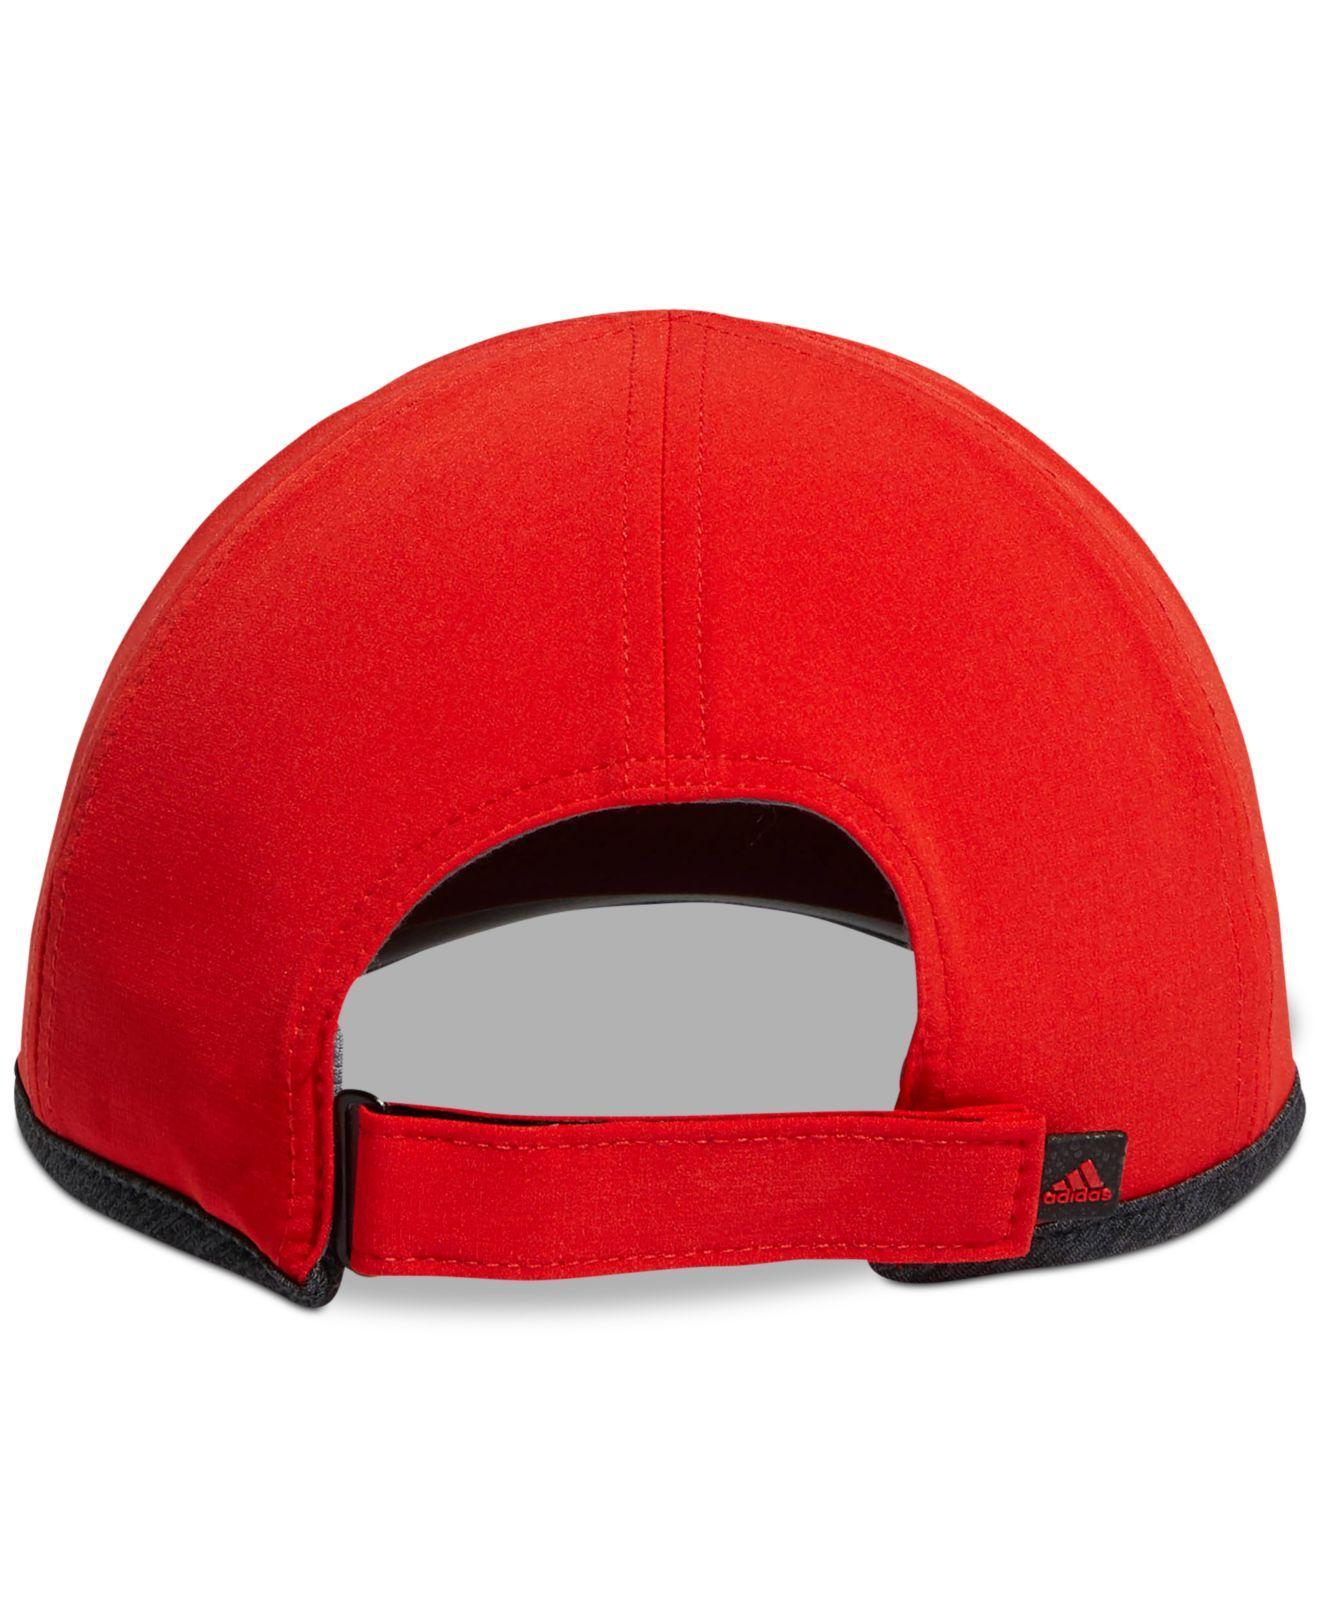 4b5eb2e2616 Lyst - adidas Adizero Superlite Hat in Red for Men